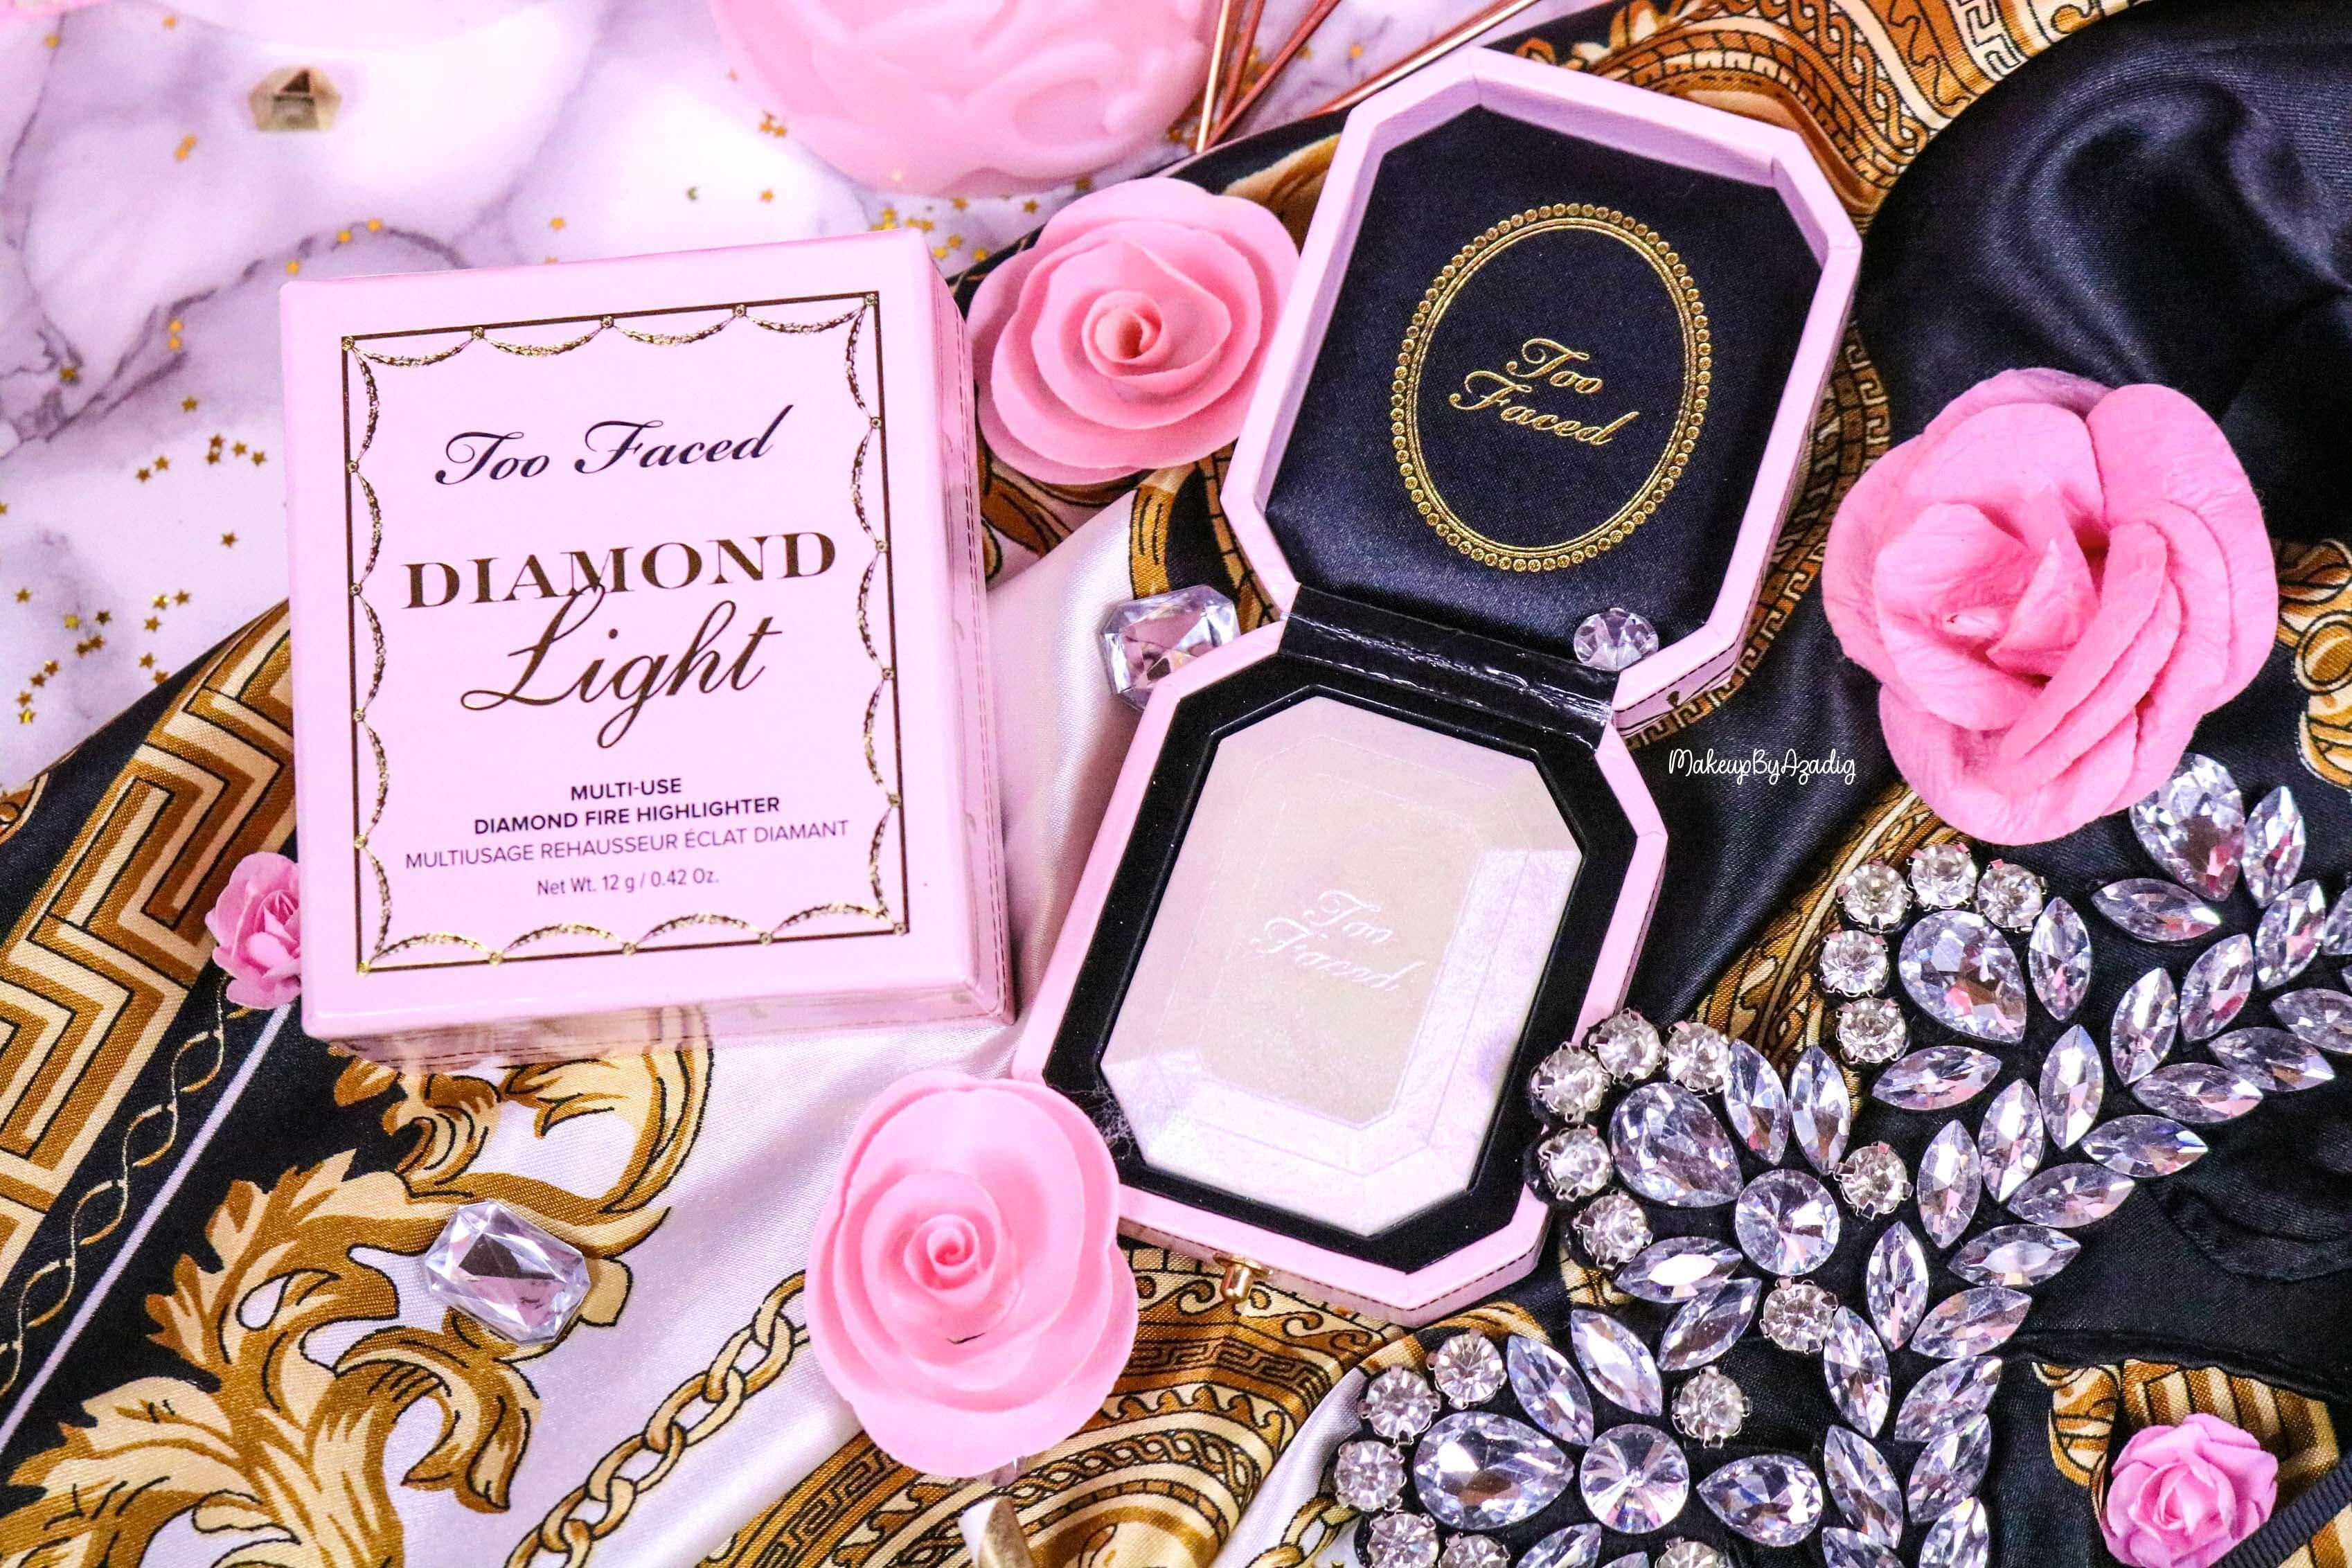 revue-highlighter-diamond-light-toofaced-enlumineur-diamant-collection-makeup-makeupbyazadig-sortie-france-influencer-swatch-avis-prix-collector